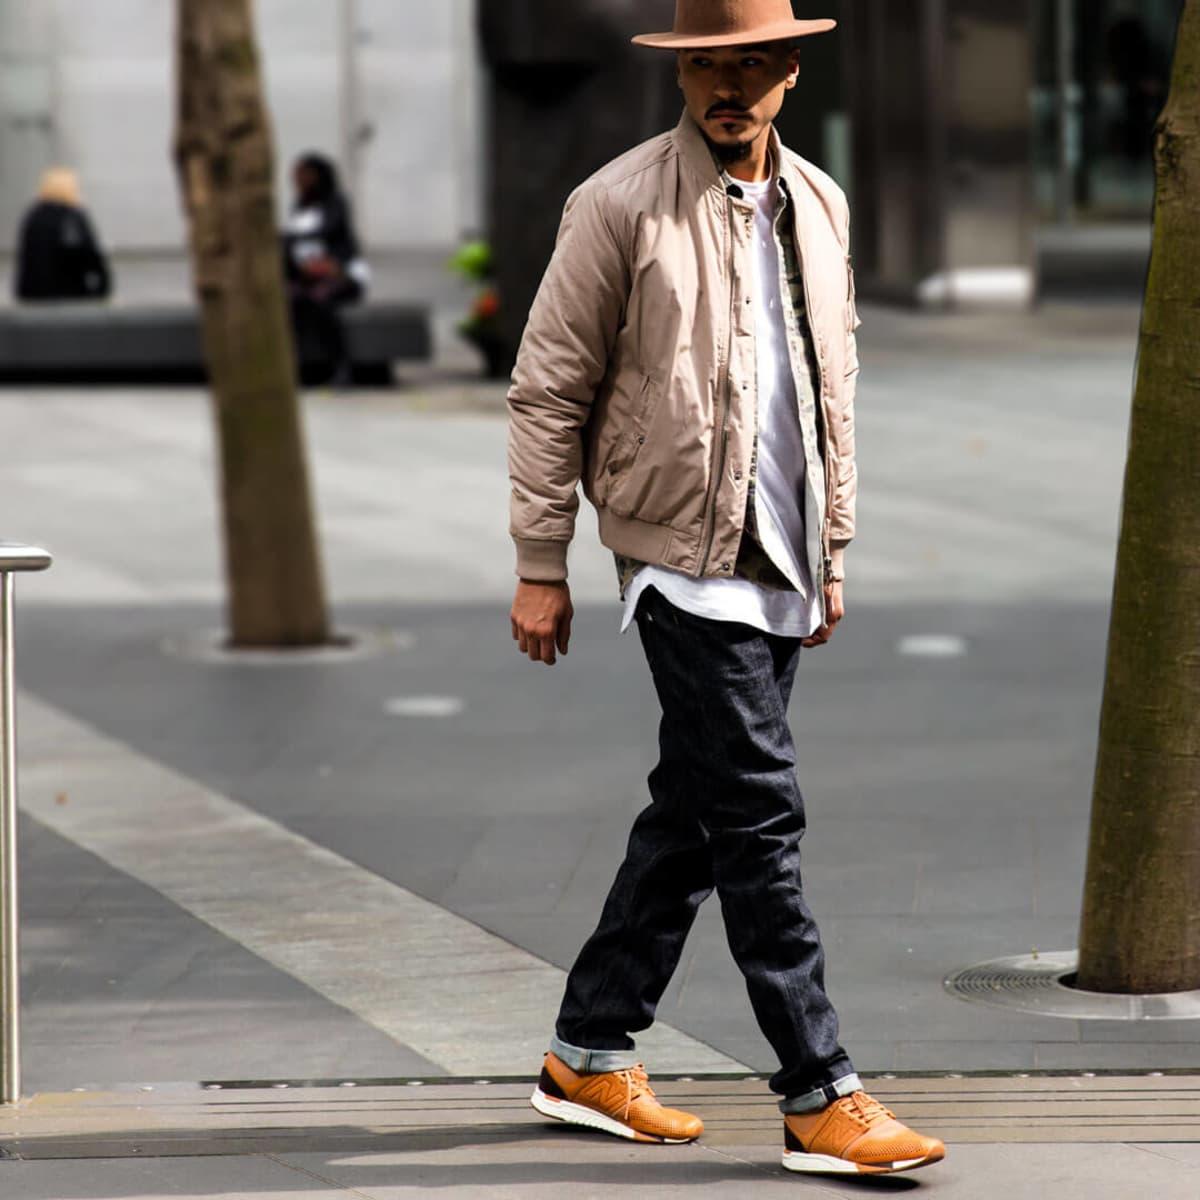 New Balance 247 shoes on model